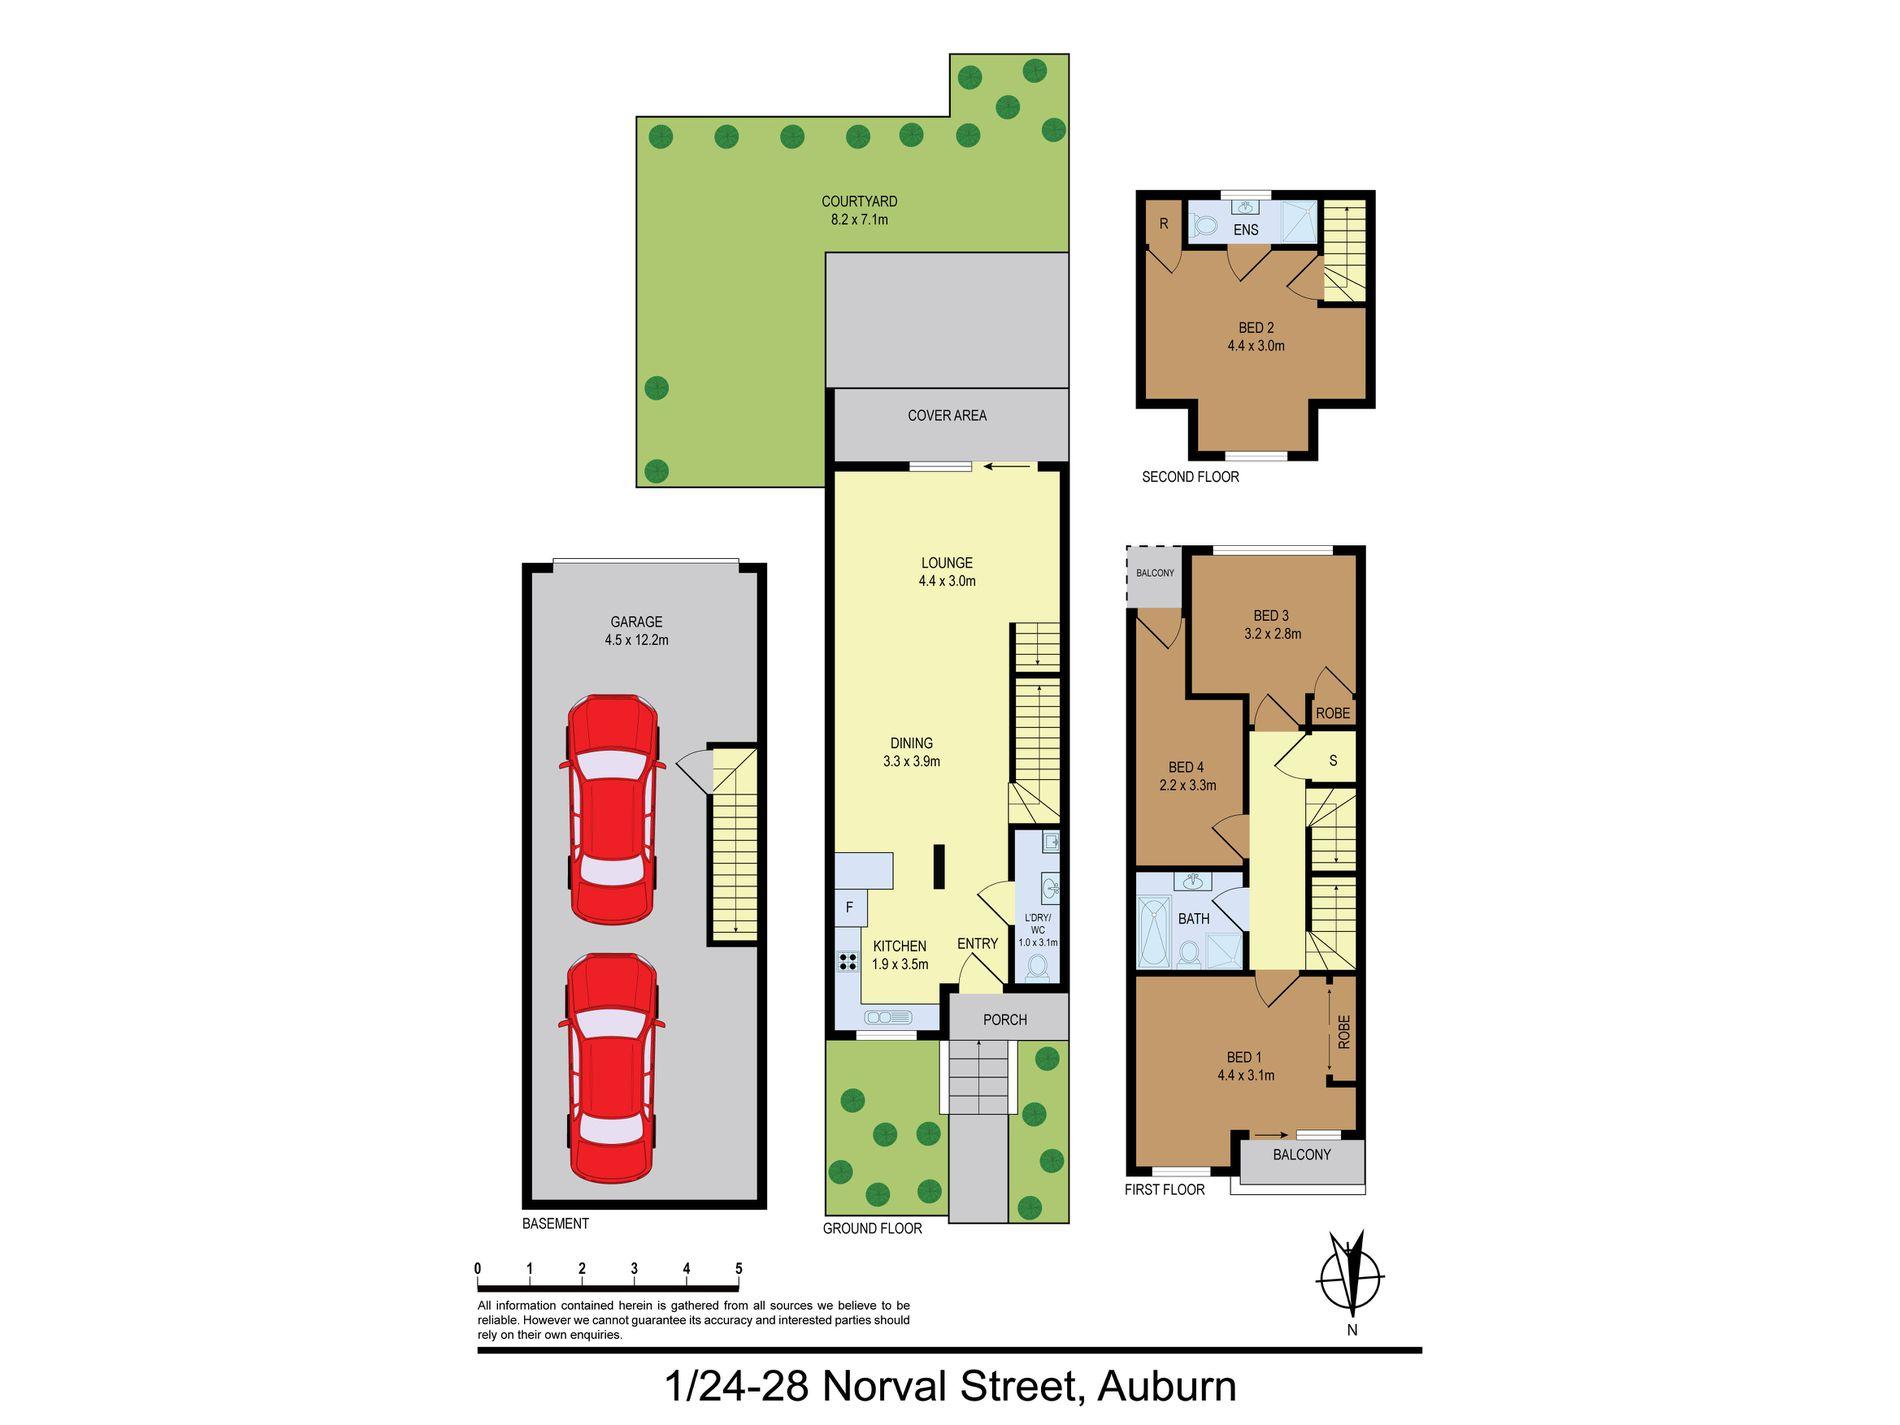 1 / 24-28 Norval Street, Auburn